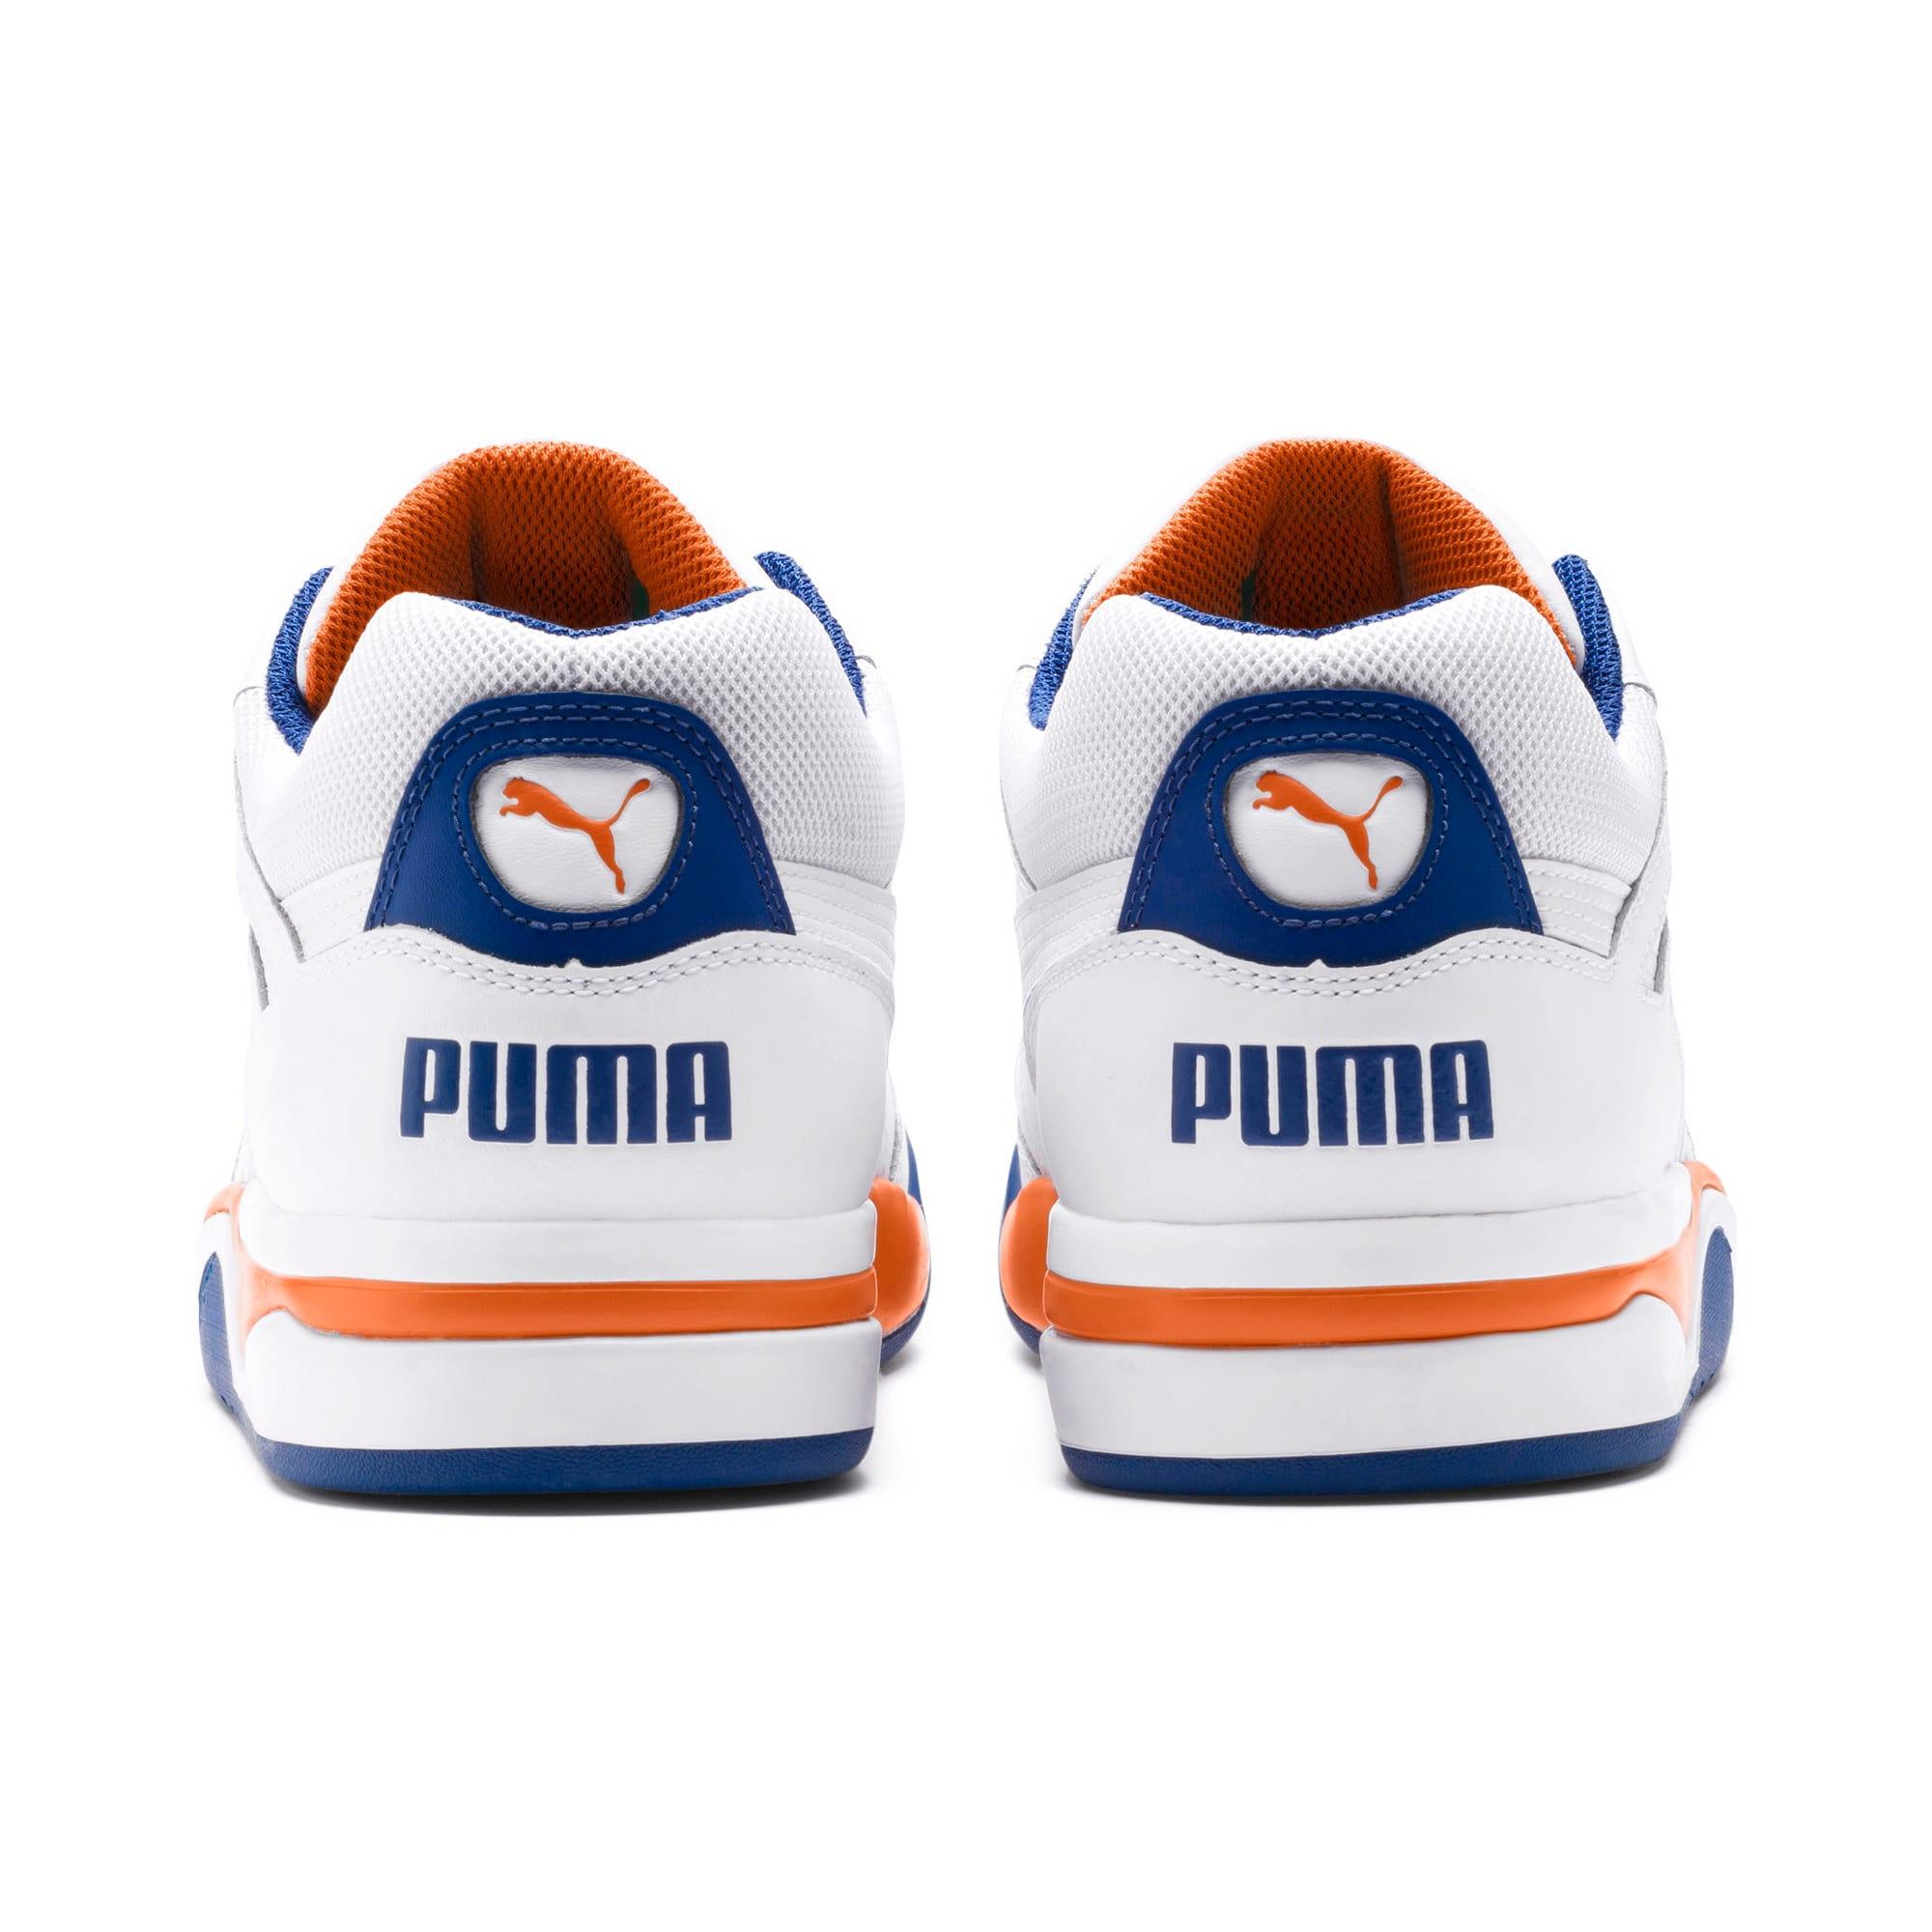 Imagen en miniatura 3 de Zapatillas de baloncesto de hombre Palace Guard, P White-Jaffa Orange-G Blue, mediana